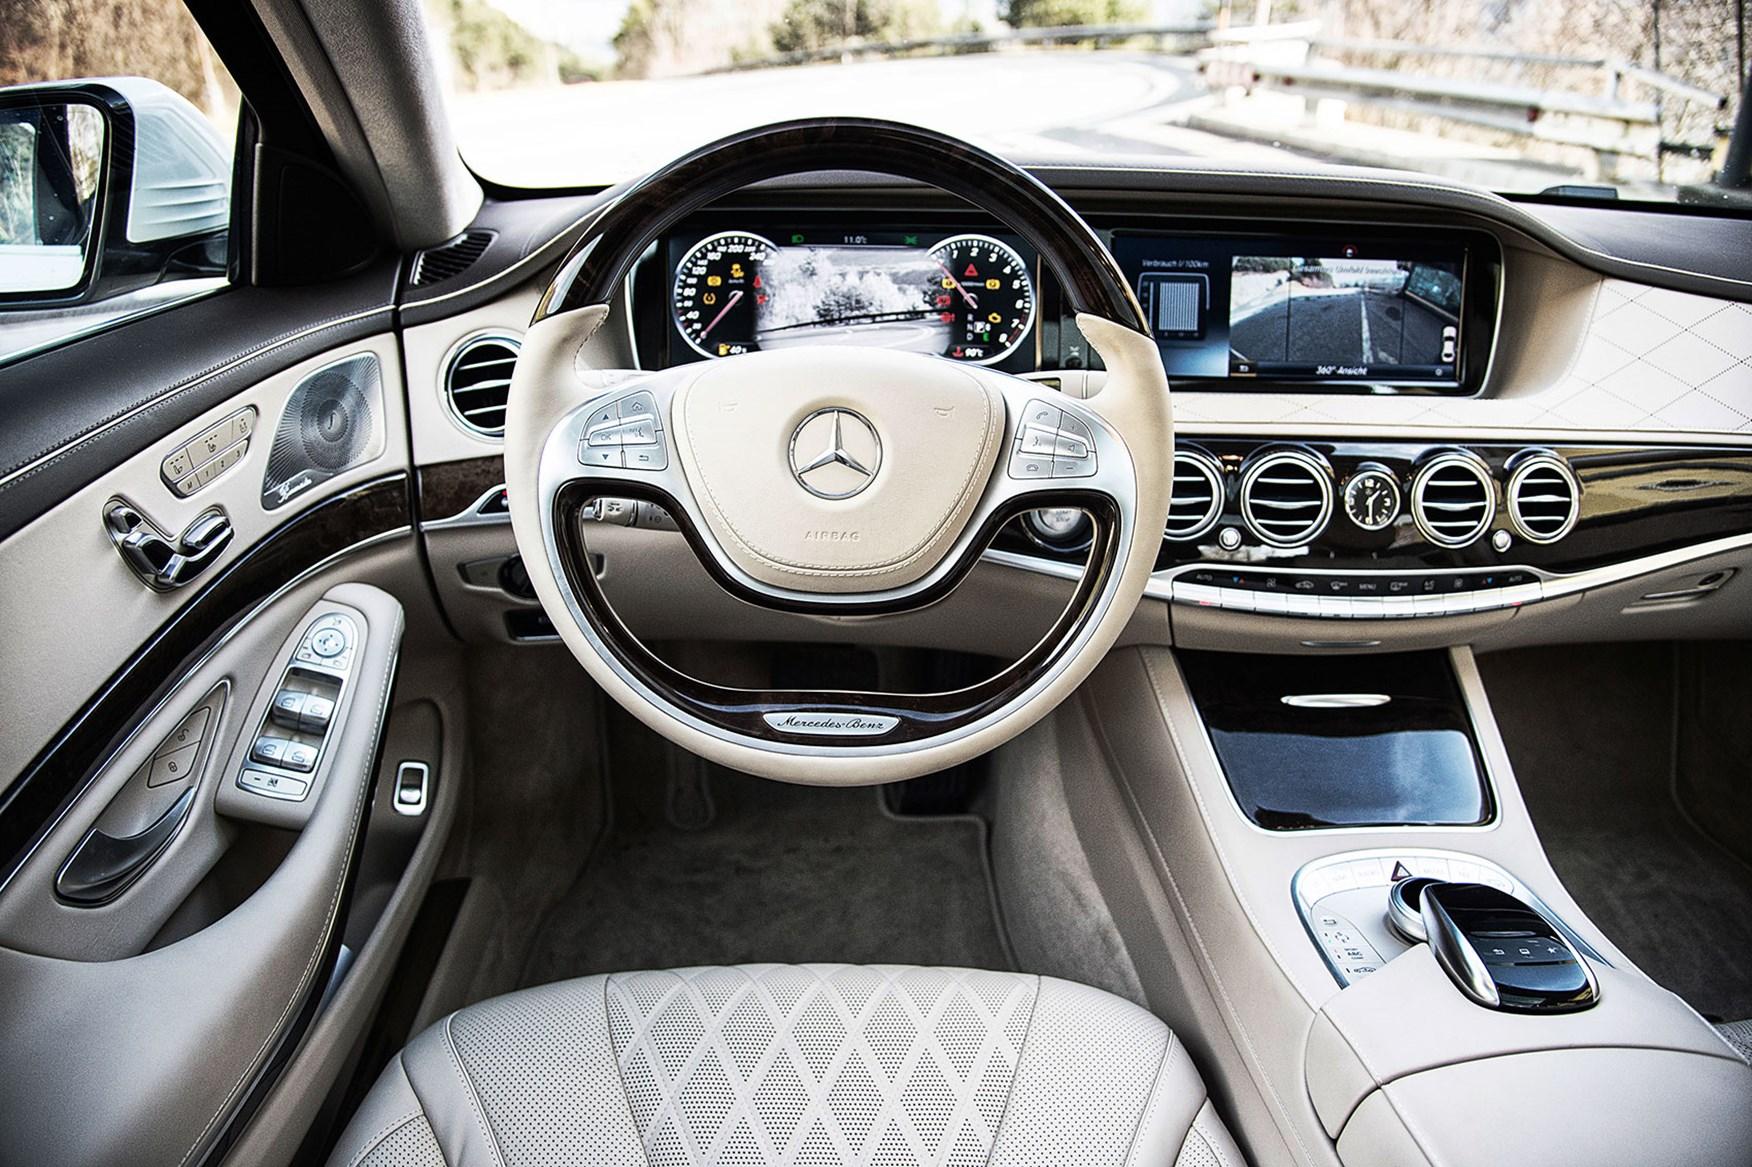 Bentley mulsanne review uk dating 1